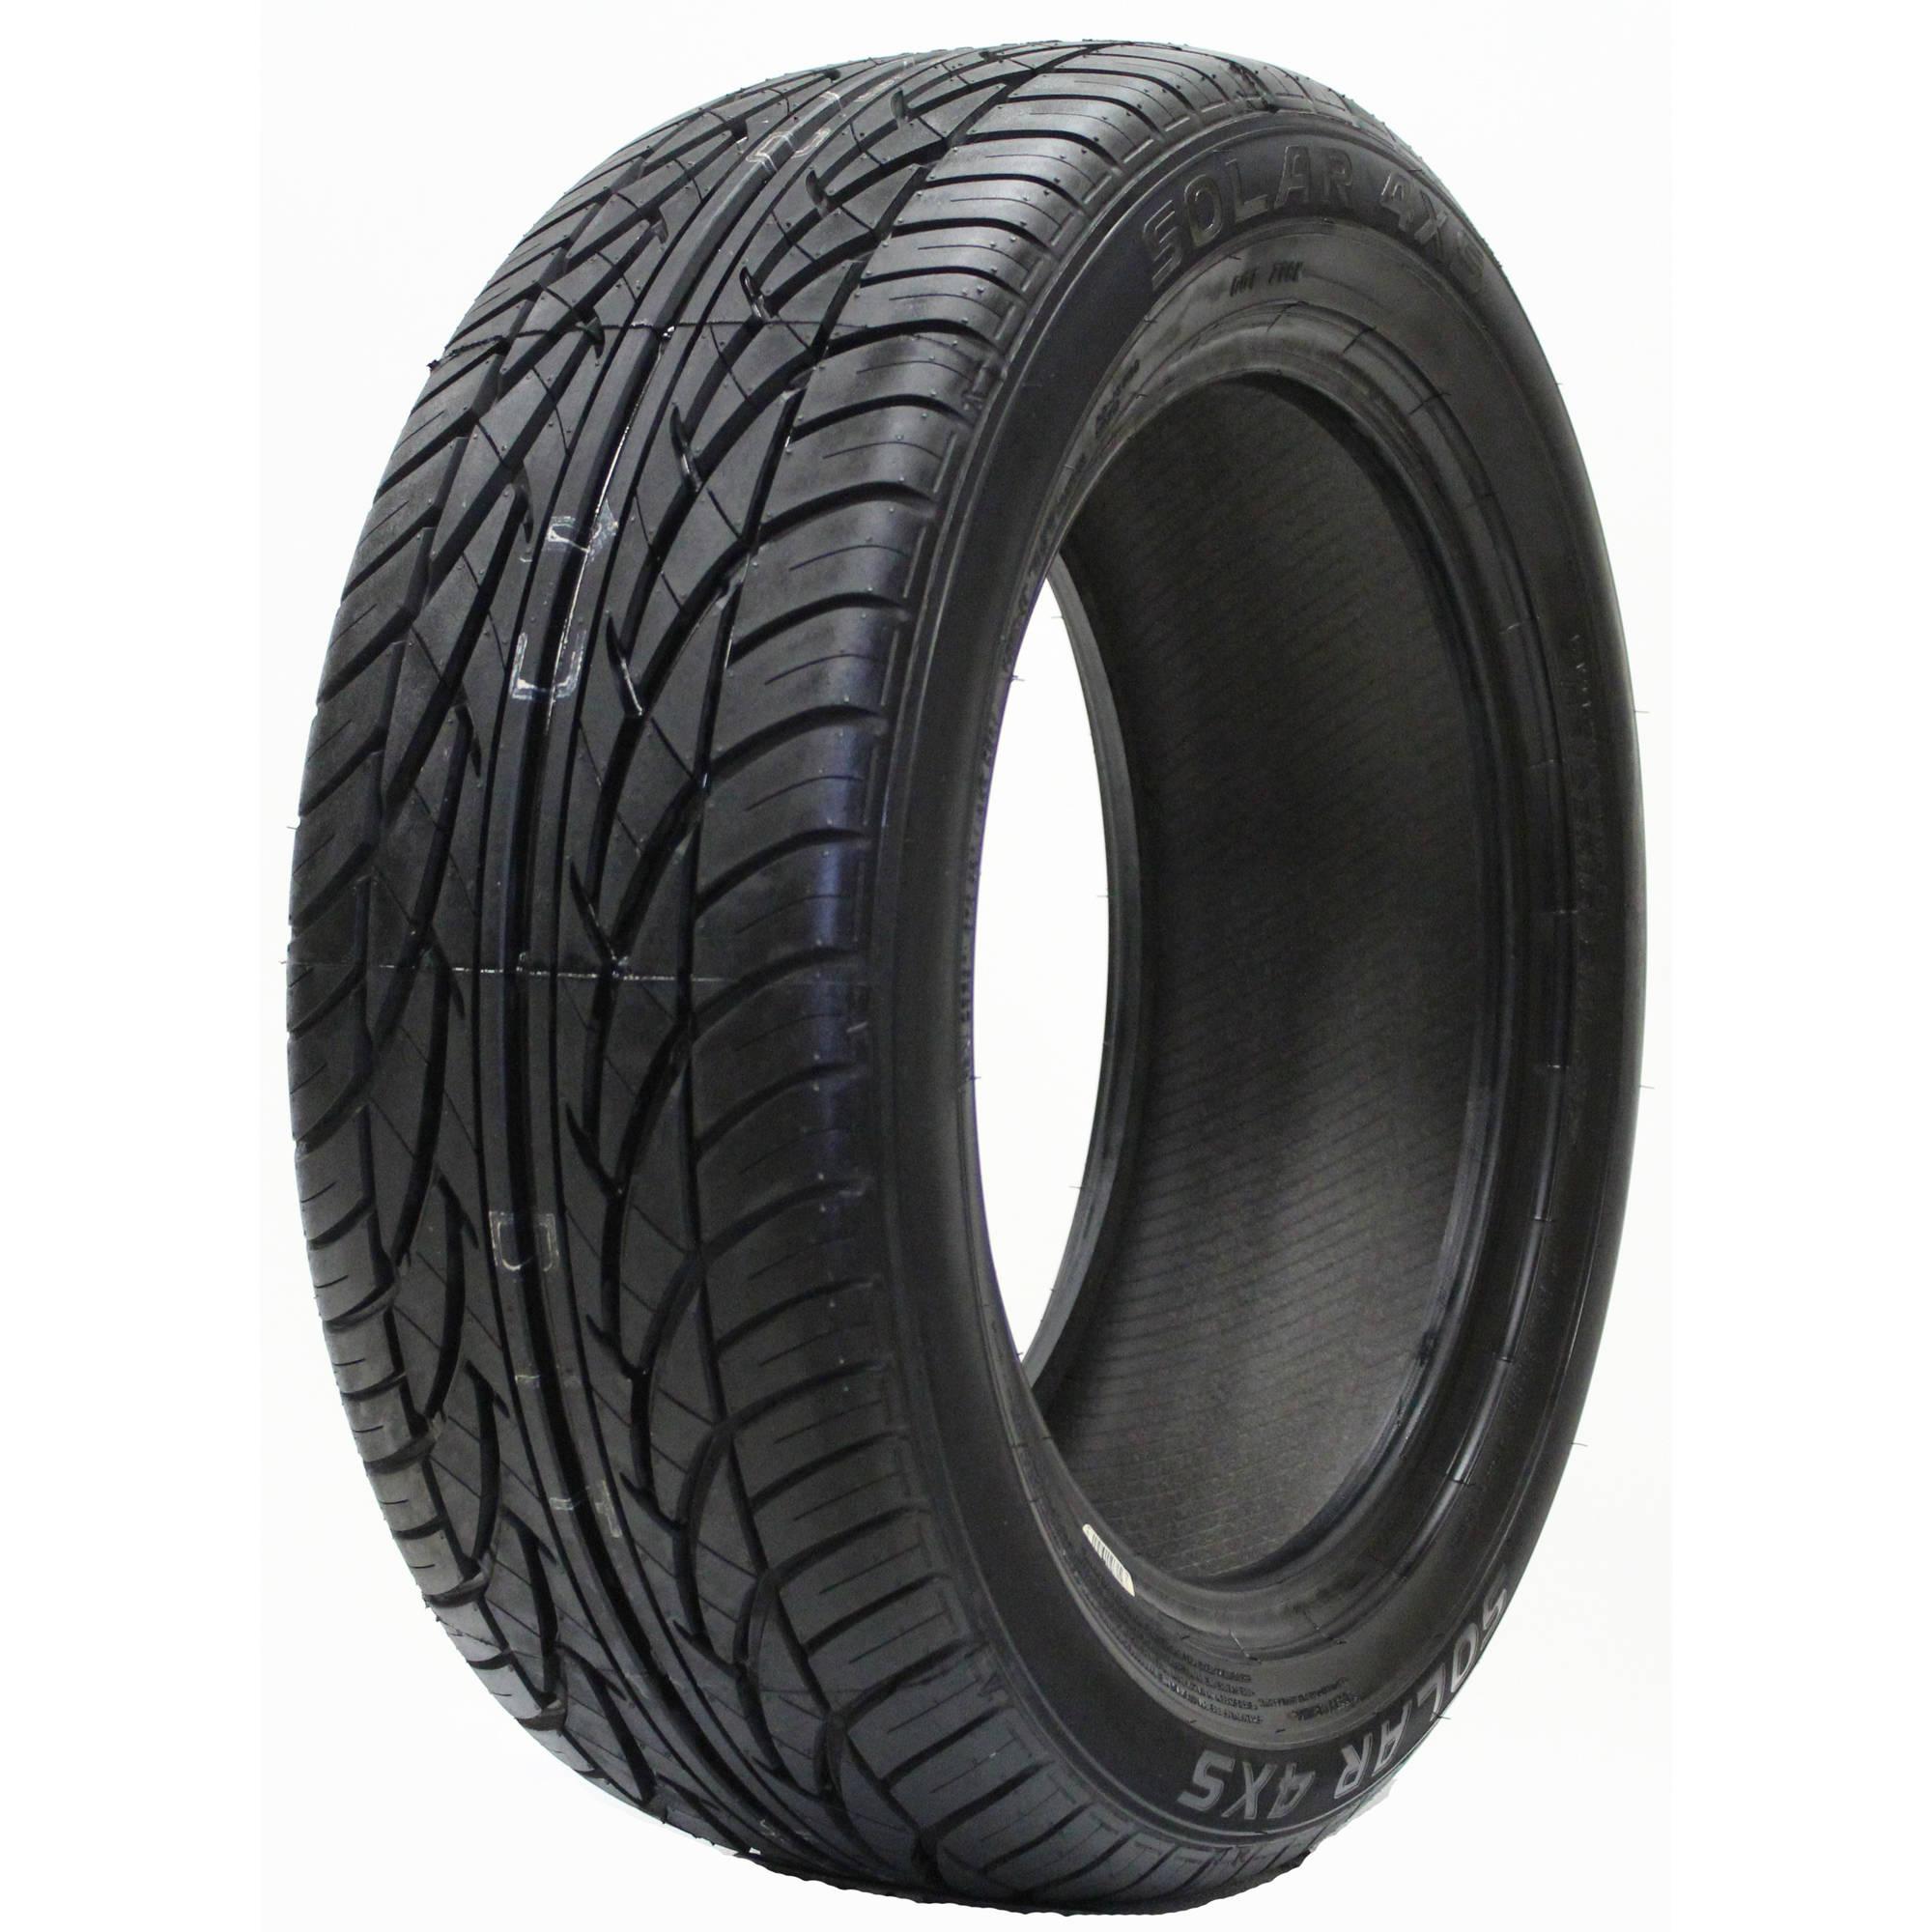 Black tire photo